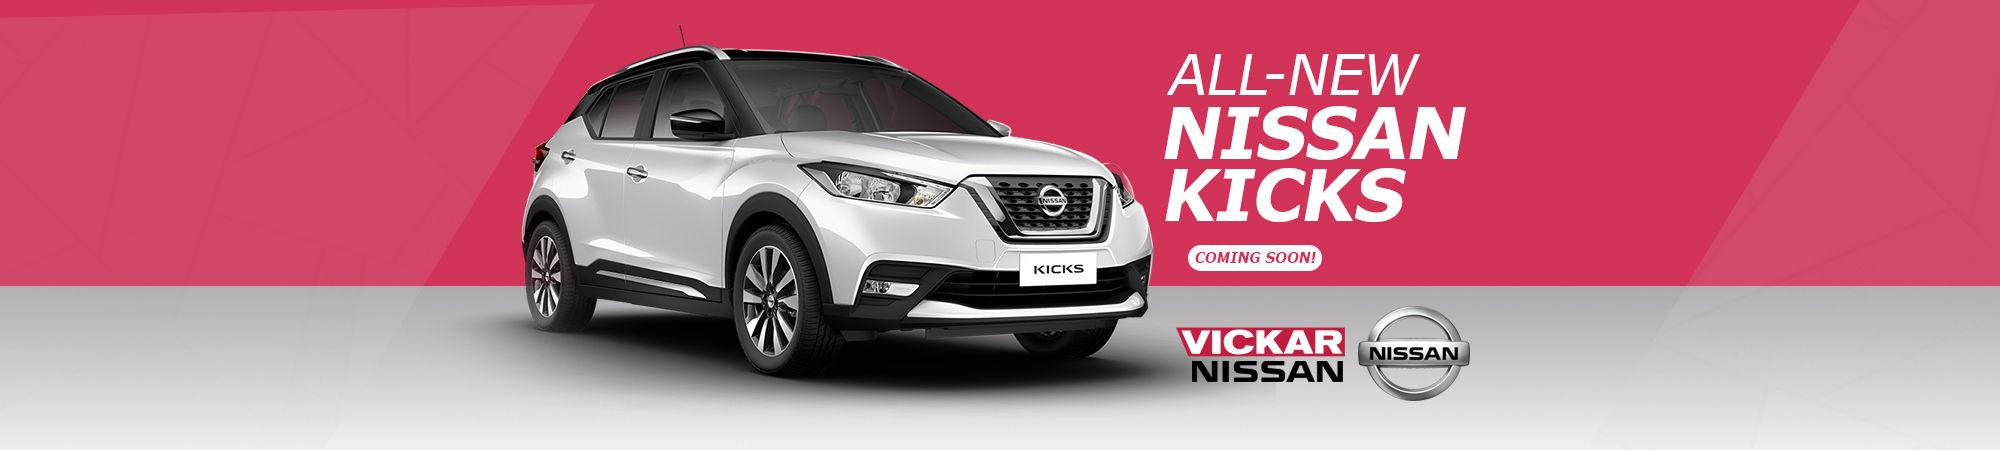 2018 Nissan Kicks -- Coming Soon!